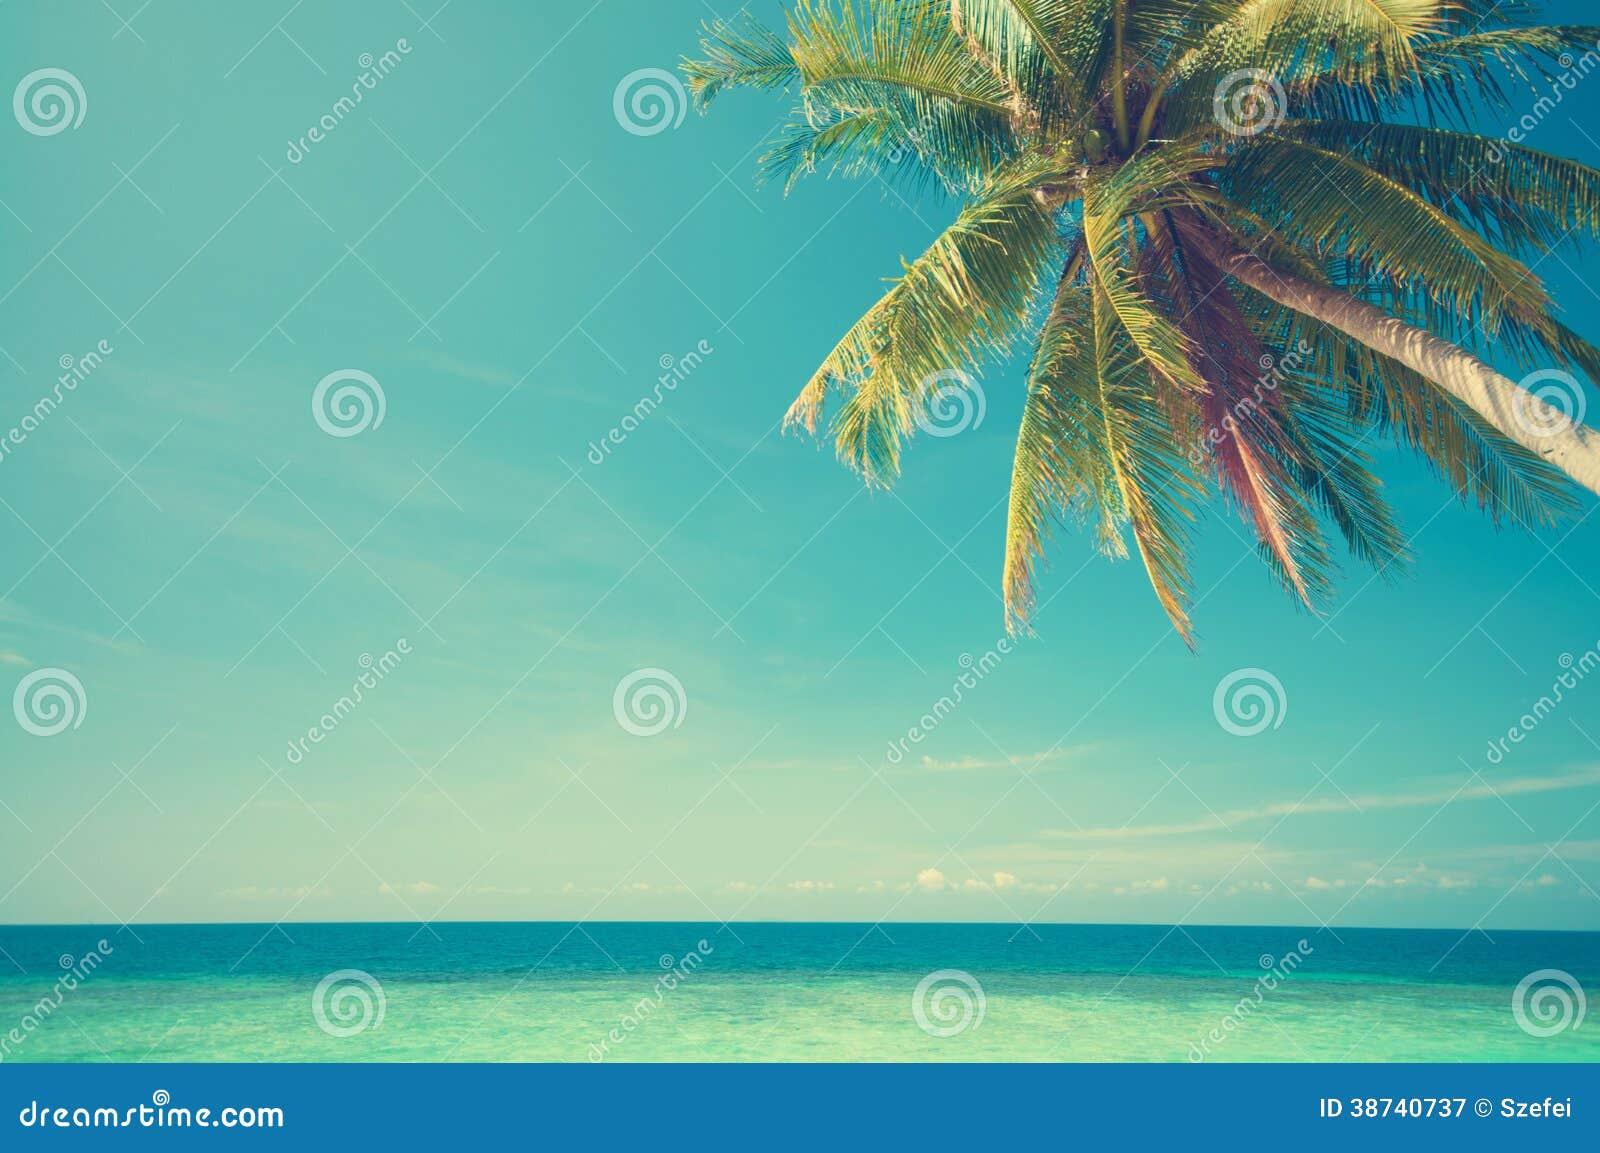 Summer sea view